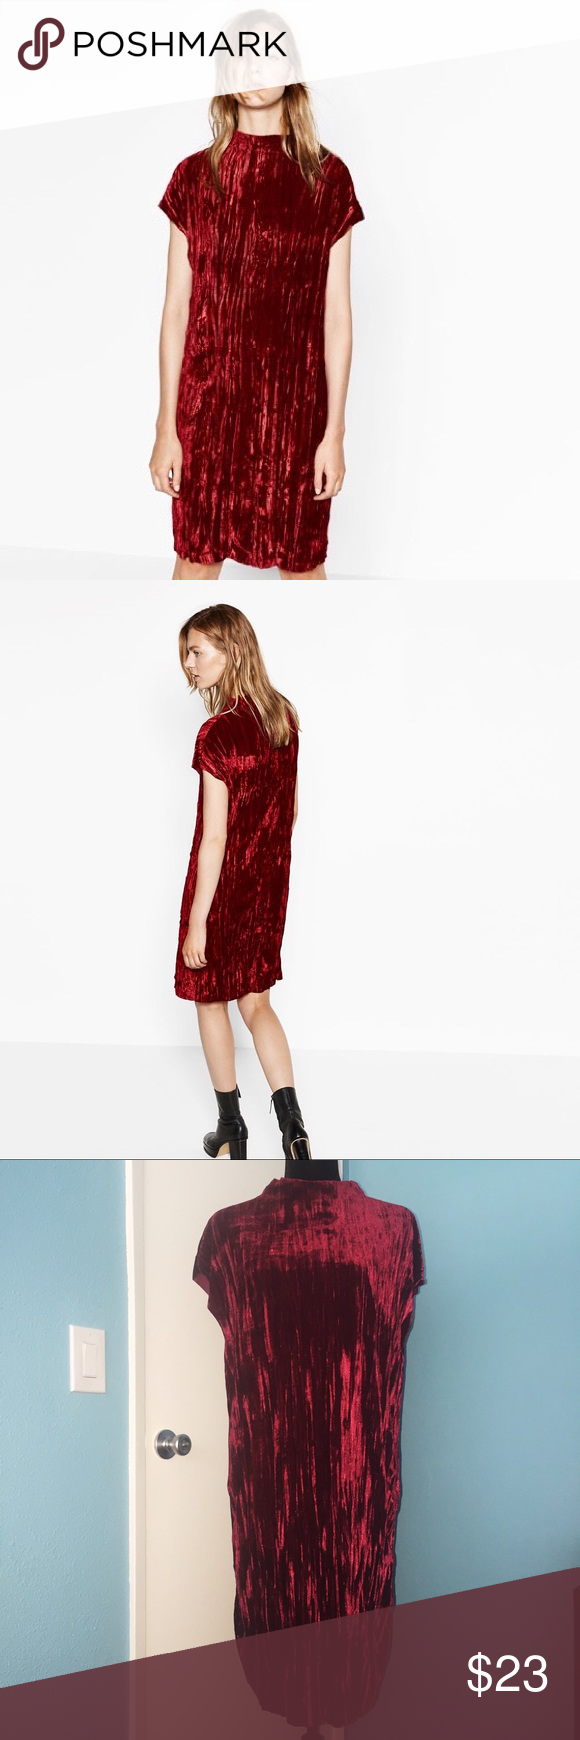 6ae80f4042 Zara Crushed Velvet Dress Burgundy mock neck crushed velvet dress. Never  been worn. 96% Polyester 4% Elastane Zara Dresses Midi